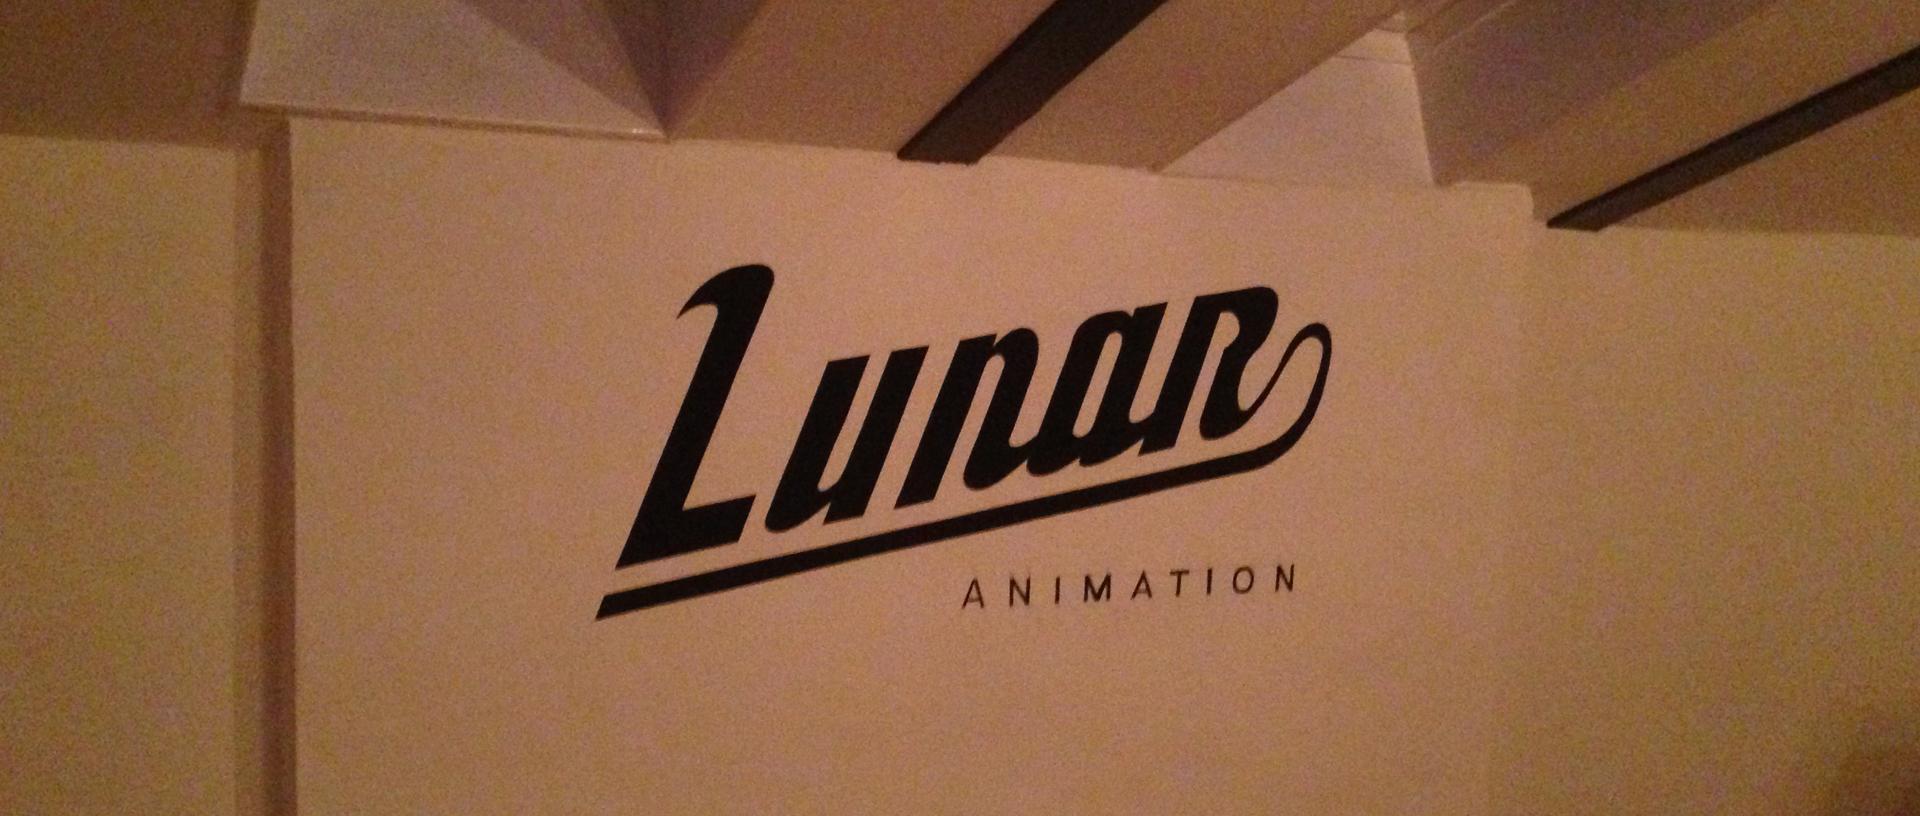 Lunar Animation Revealed